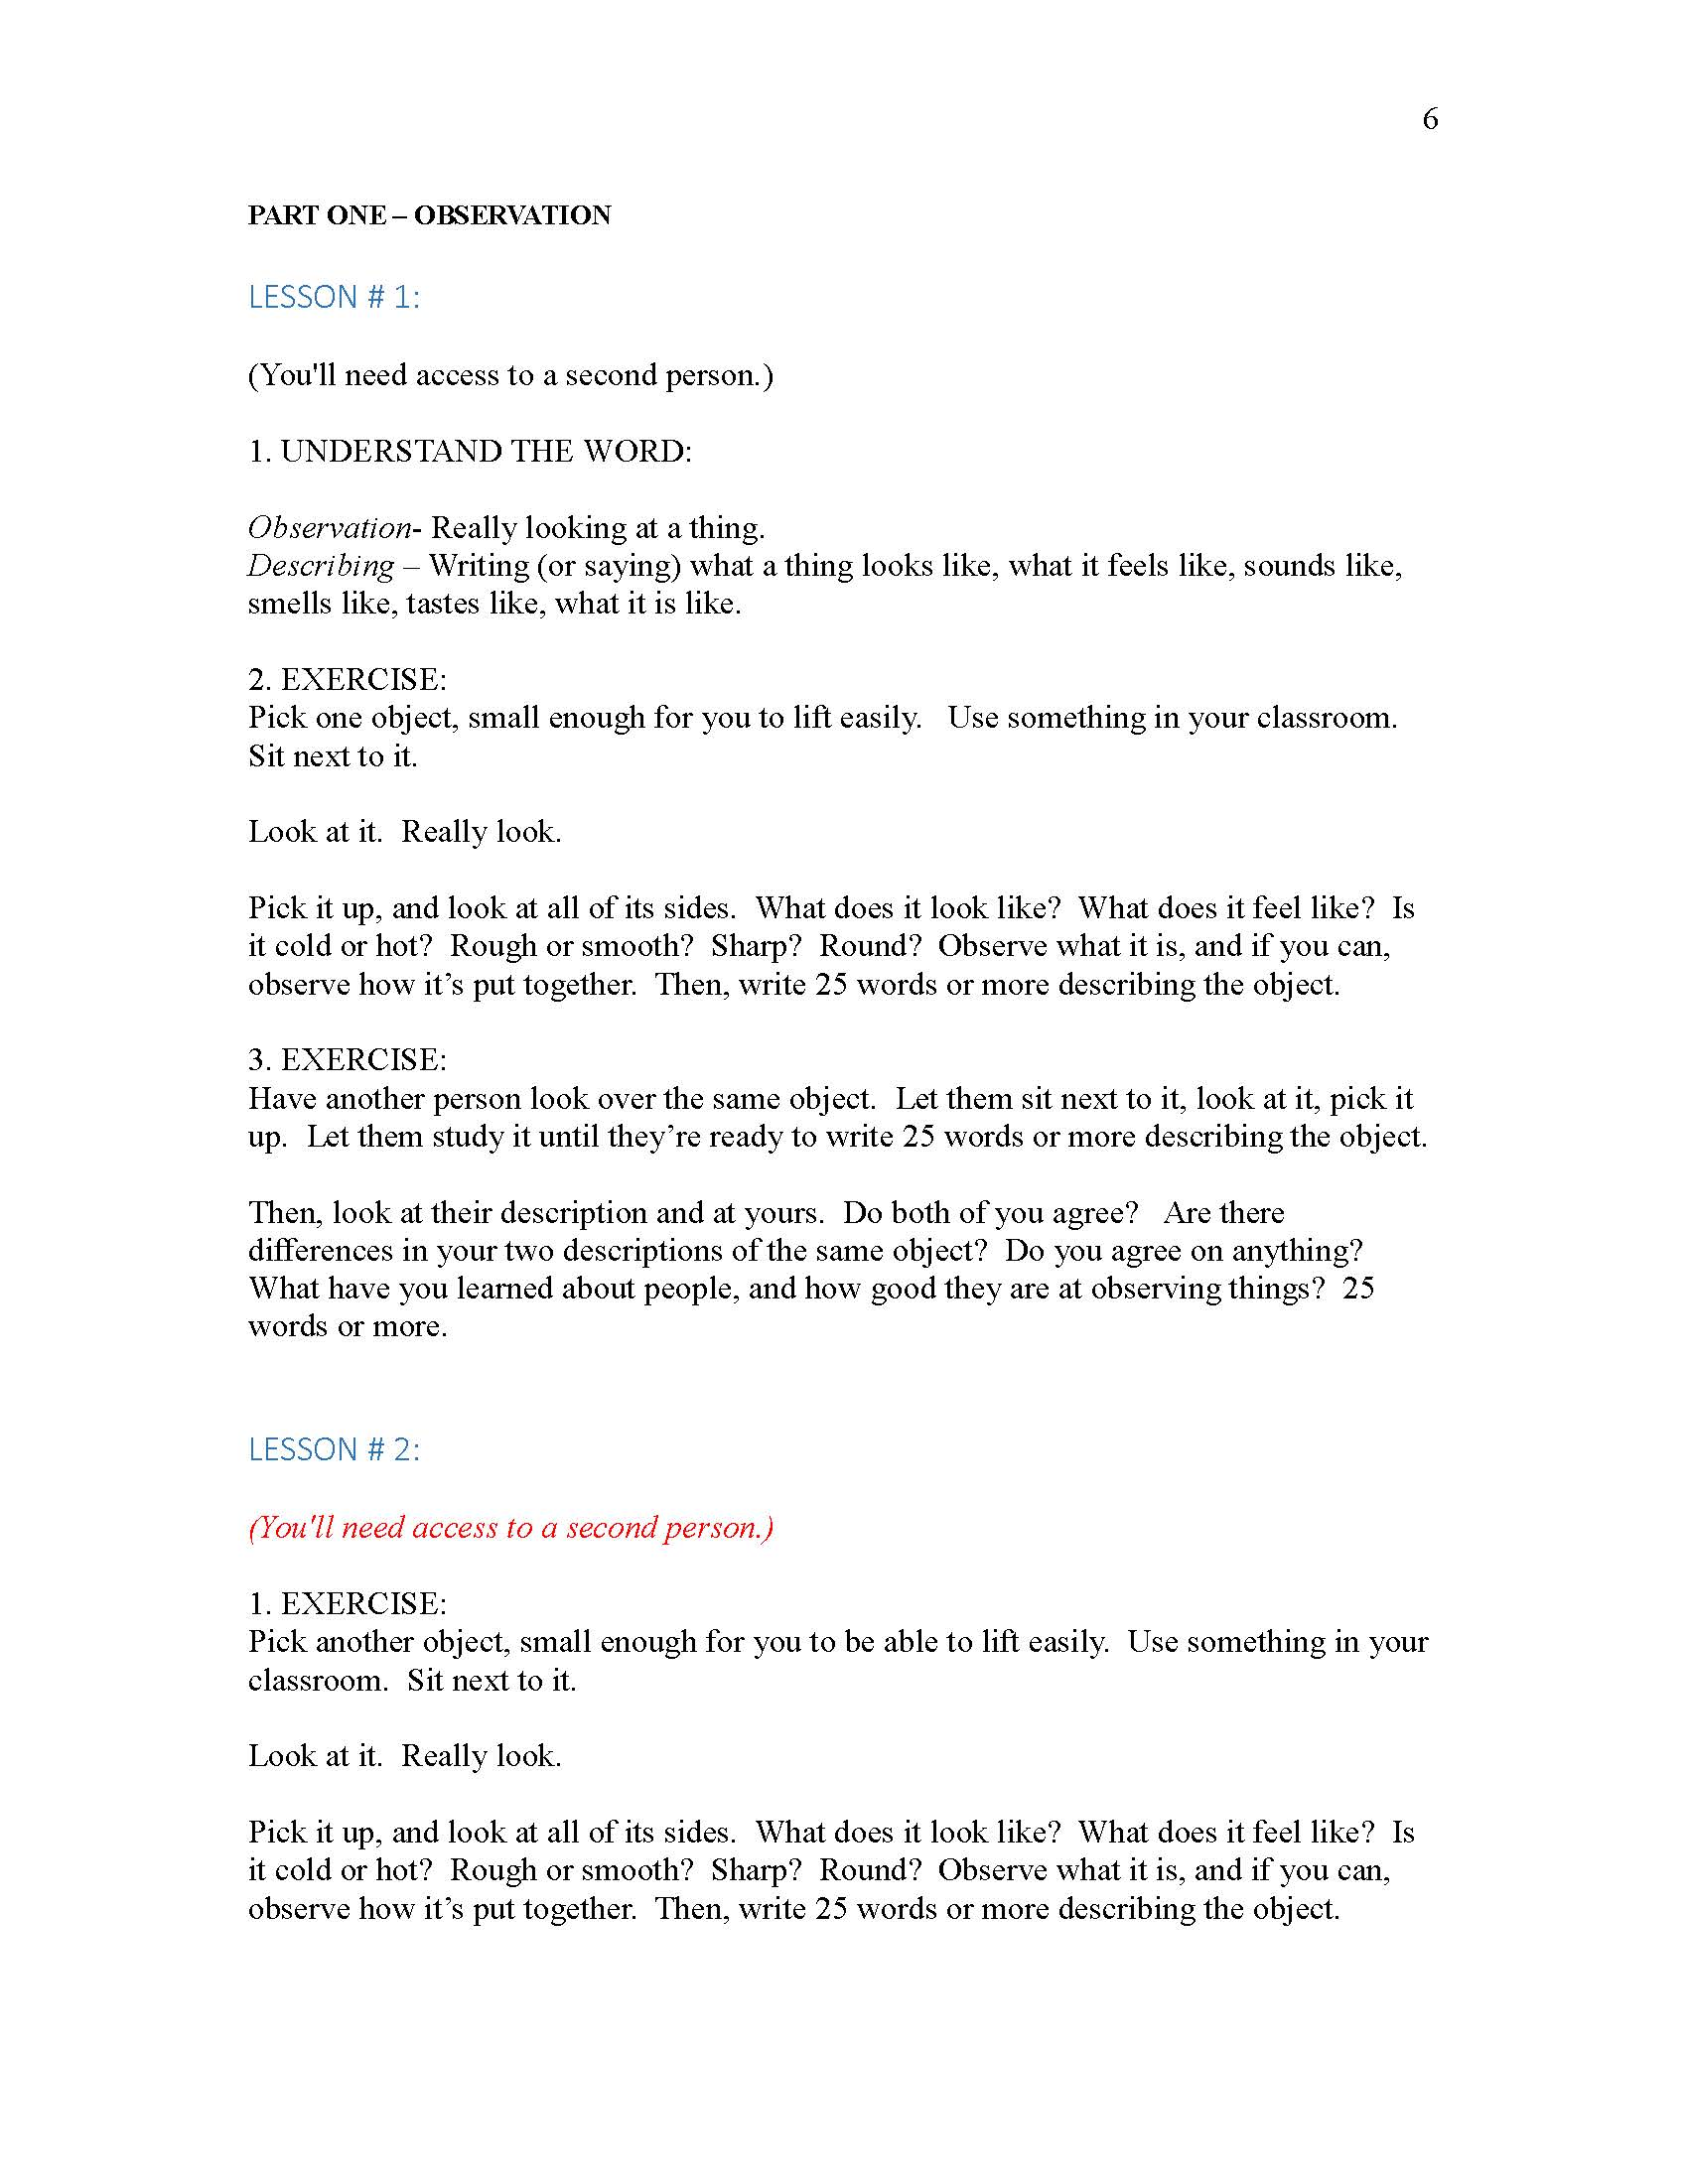 Samples Step 3 Science 1 - Science Basics_Page_07.jpg